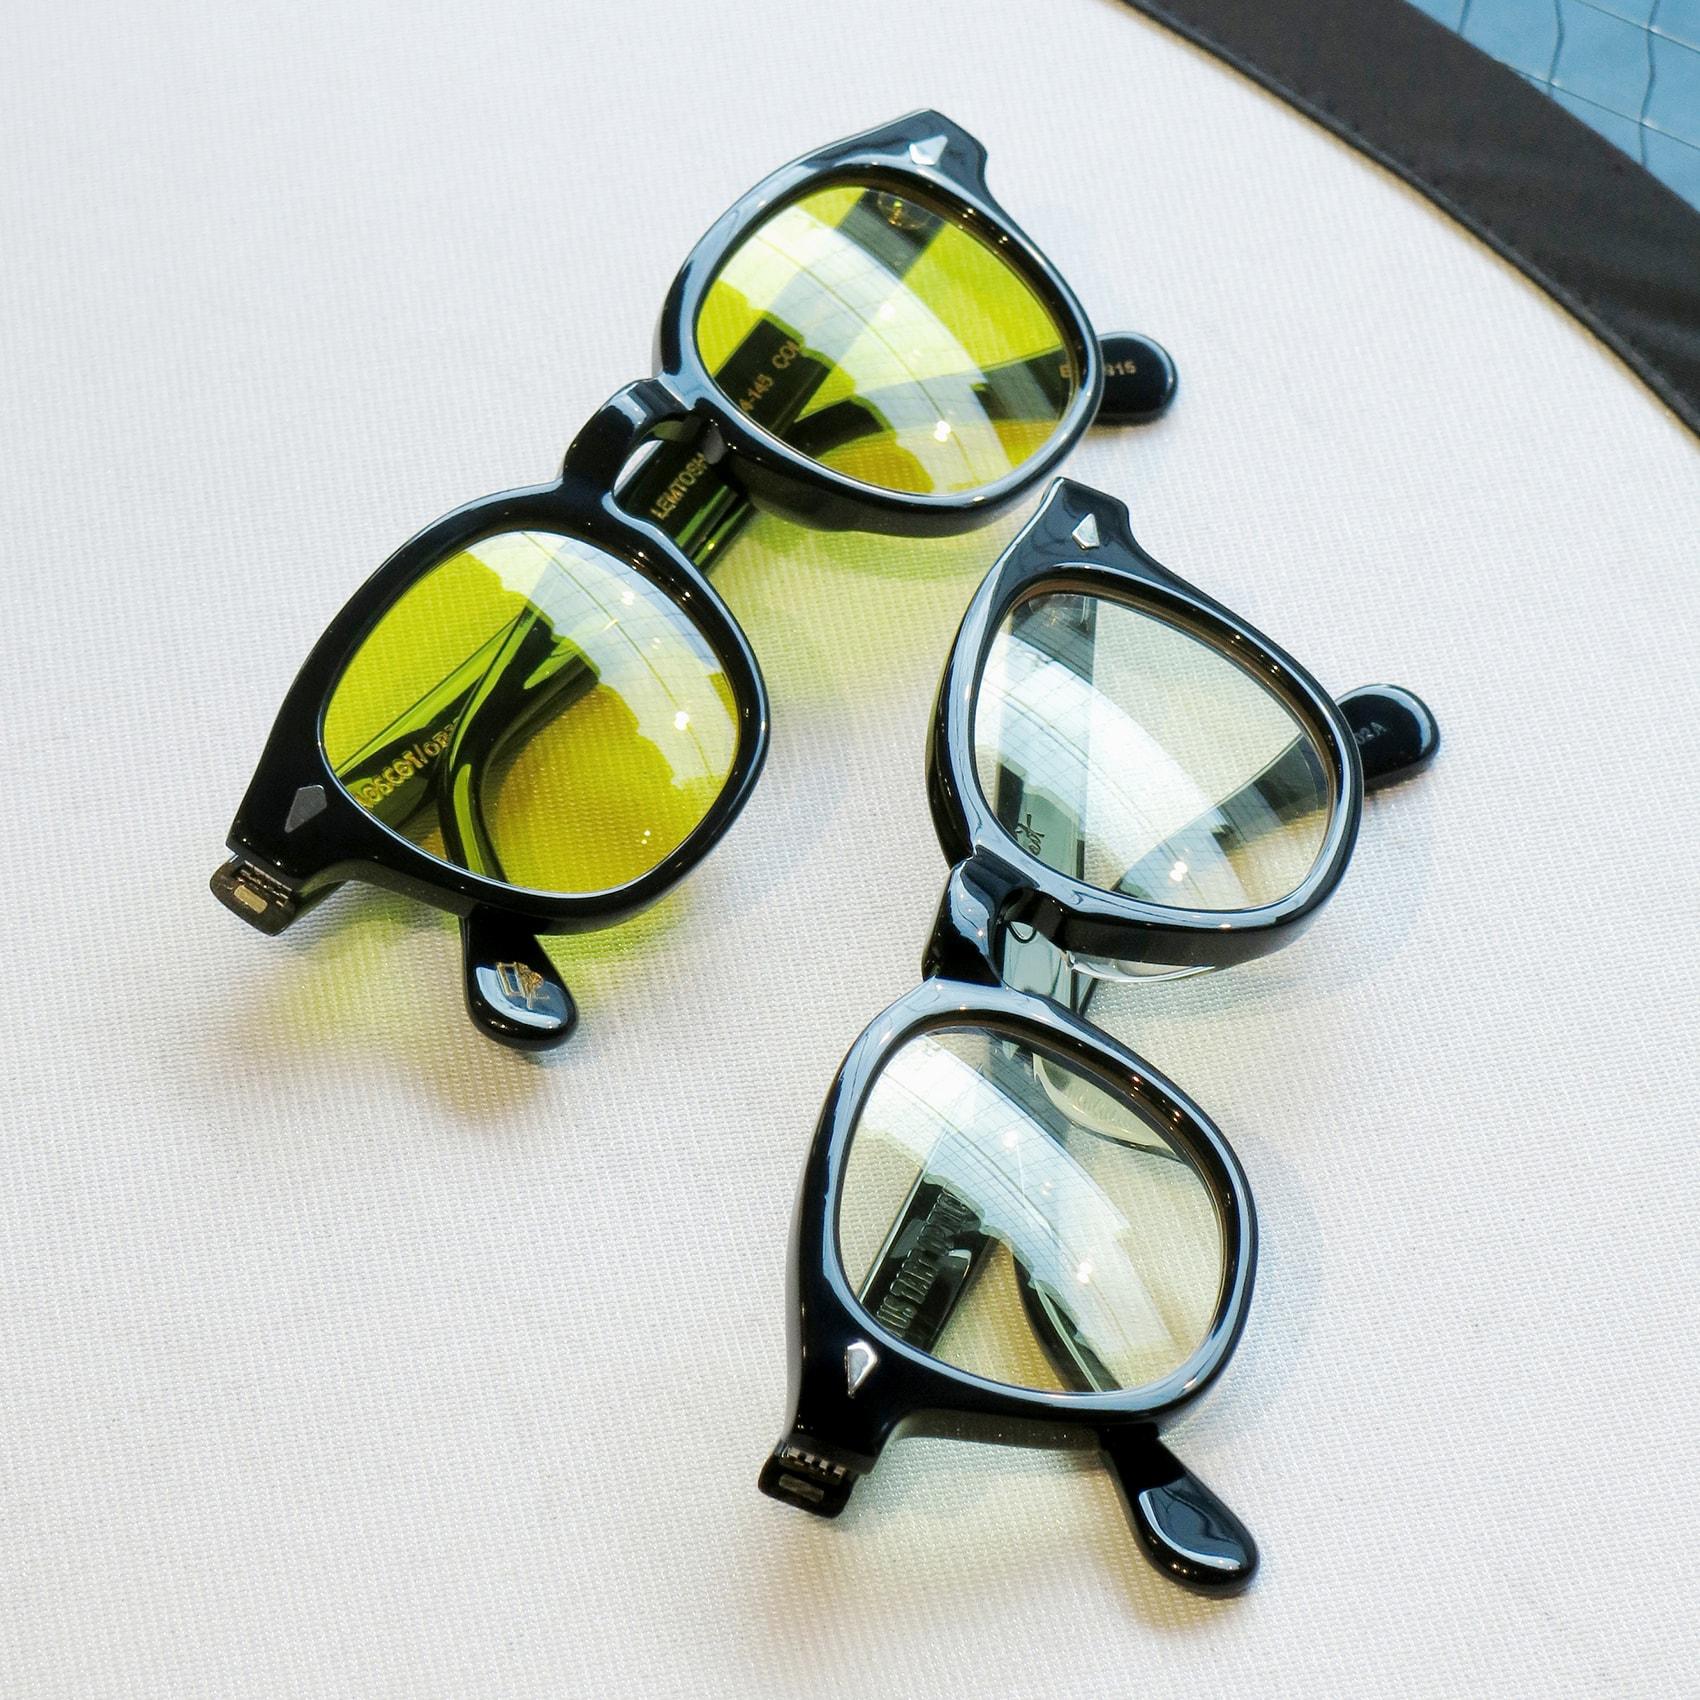 170818_arnel-lemtosh-sunglasses_yellows_02